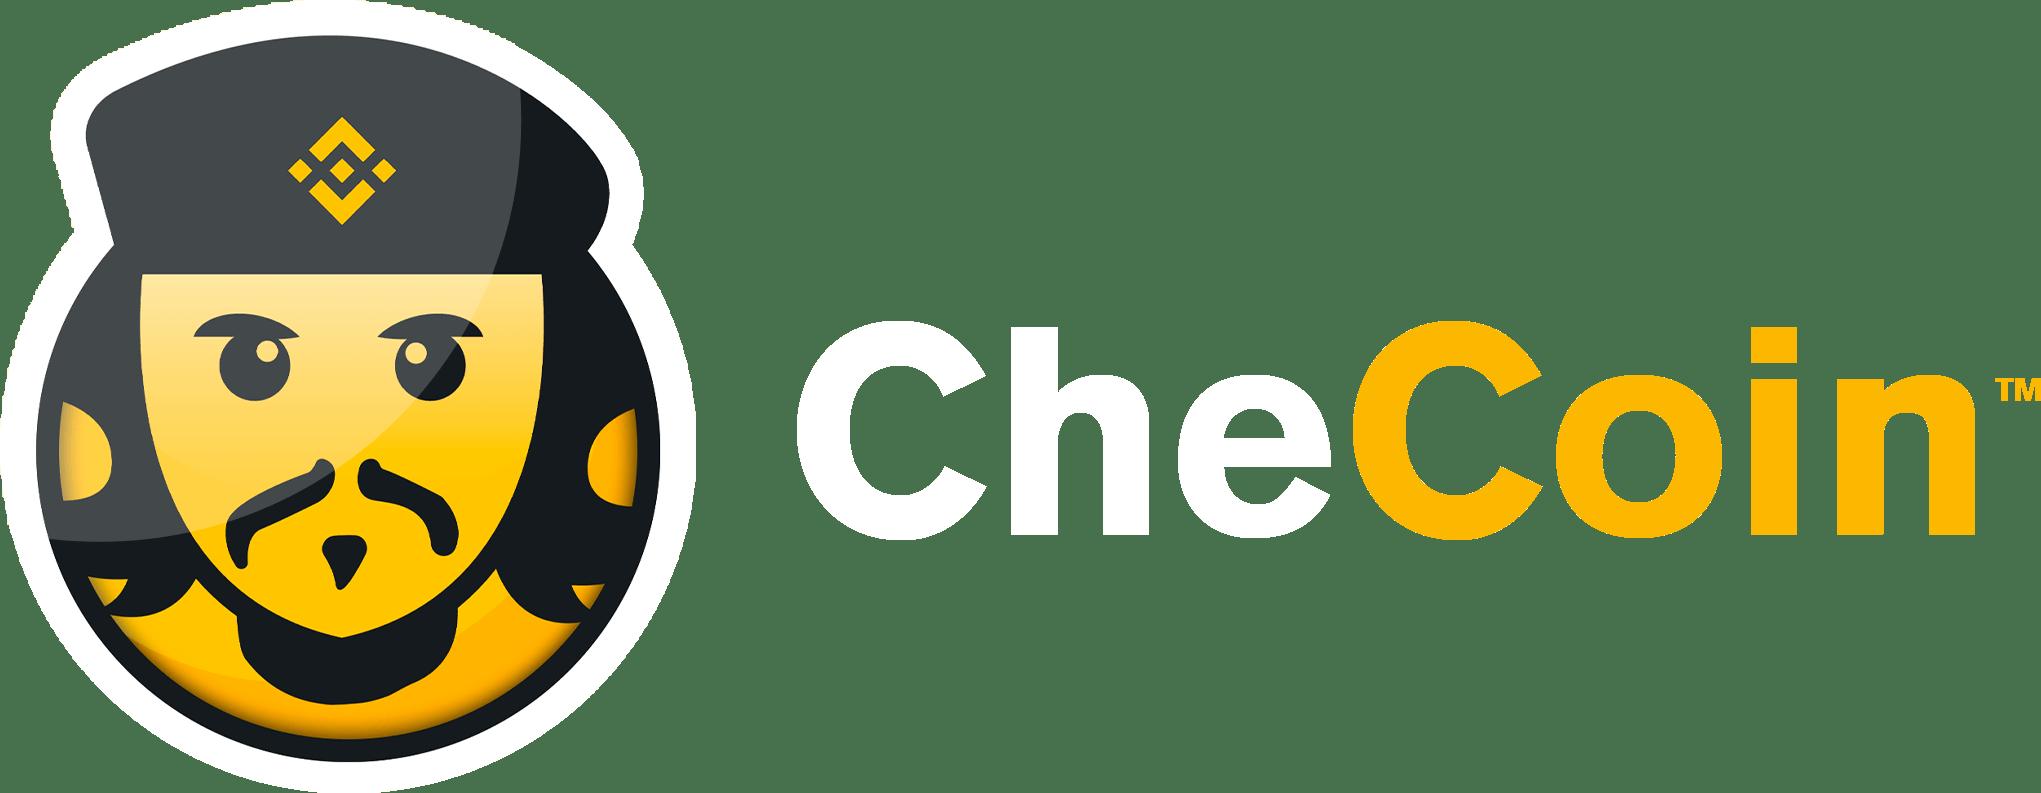 Tugan Barra Checoin